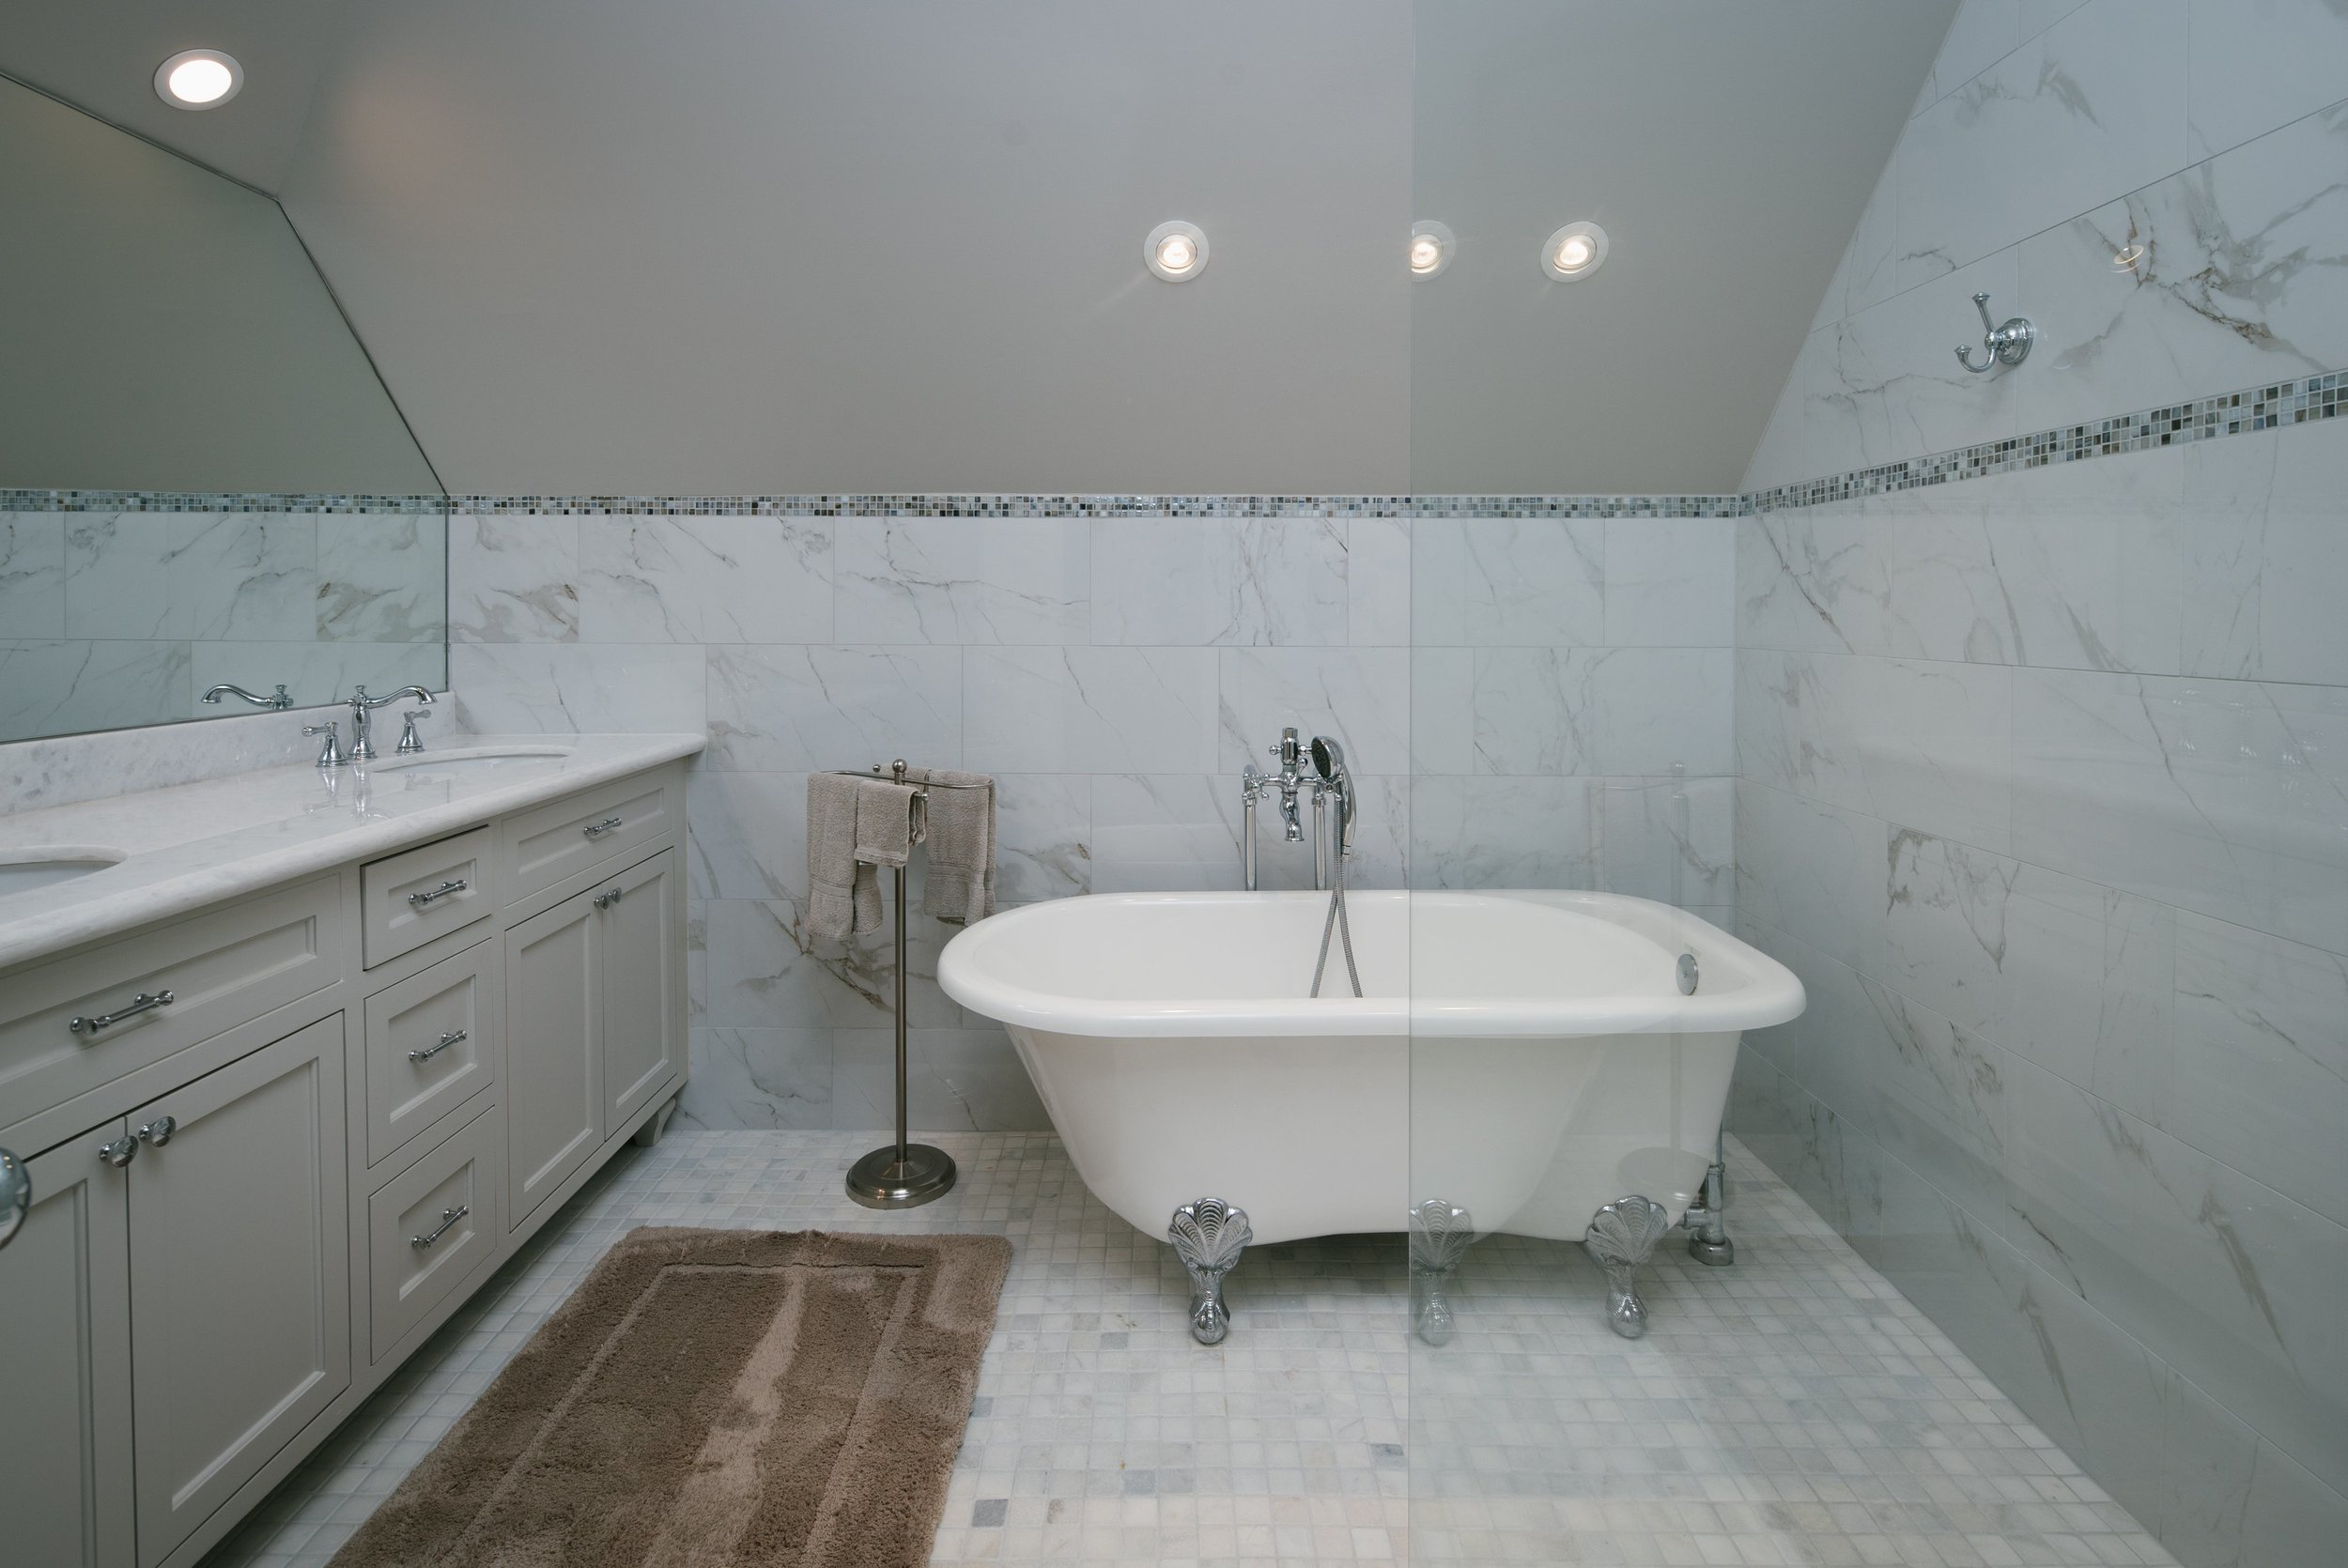 Master bathroom remodel. Clawfoot bathtub, tile, frames walk in shower, marble countertops.